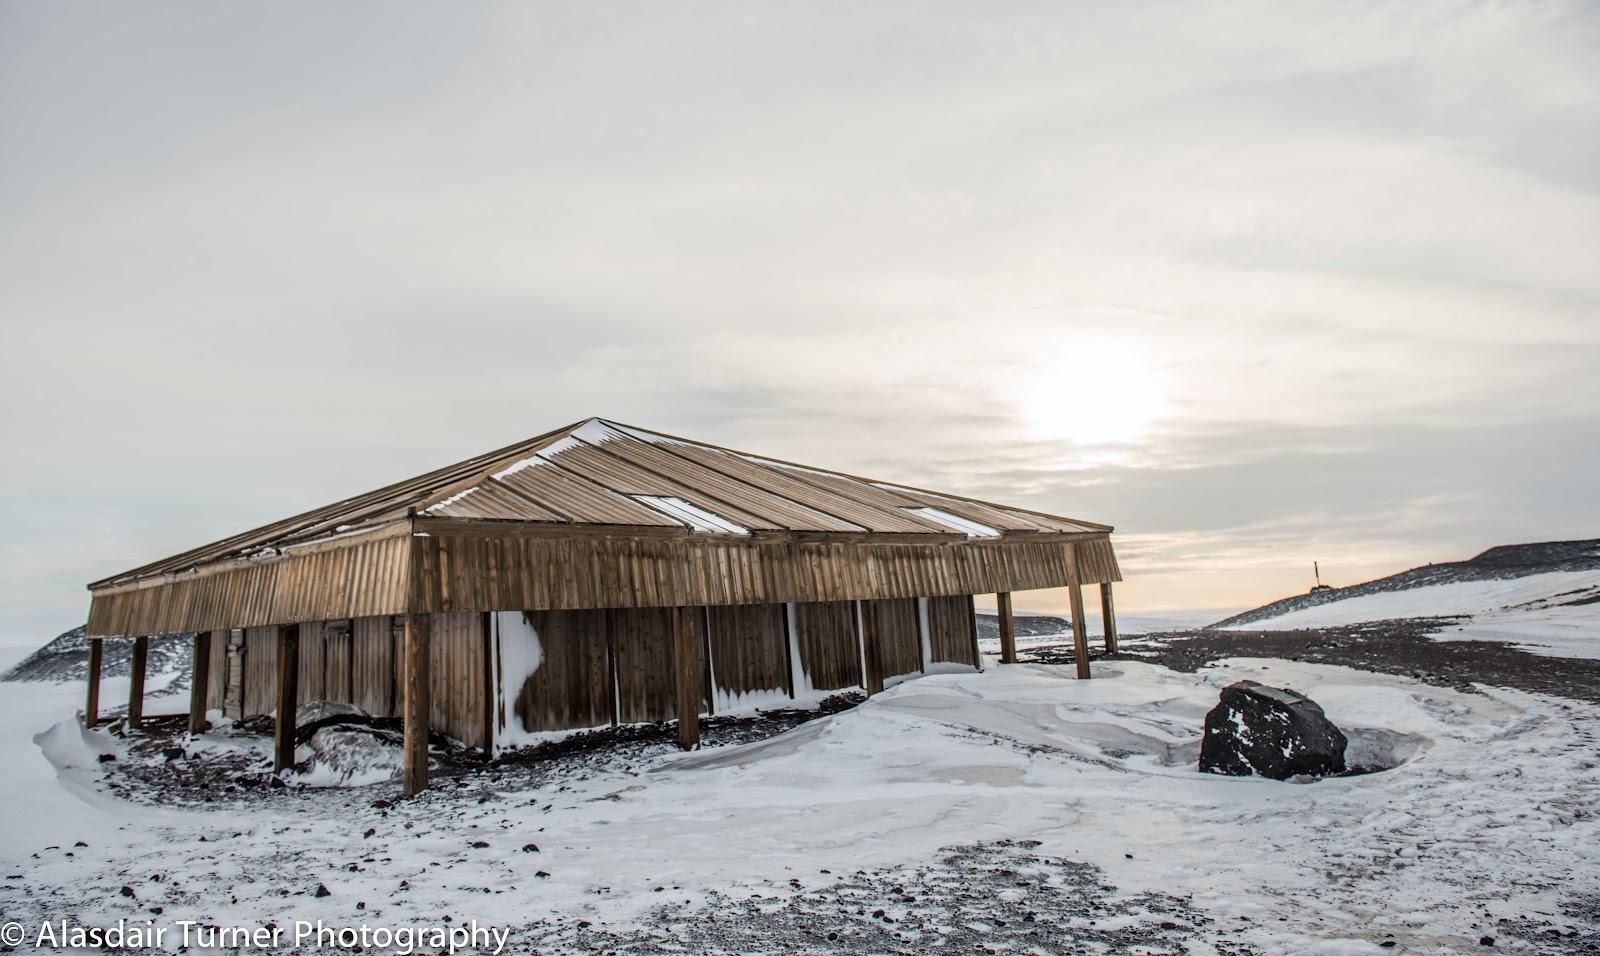 Captain Scott's Discovery Hut at Hut Point, Antarctica.